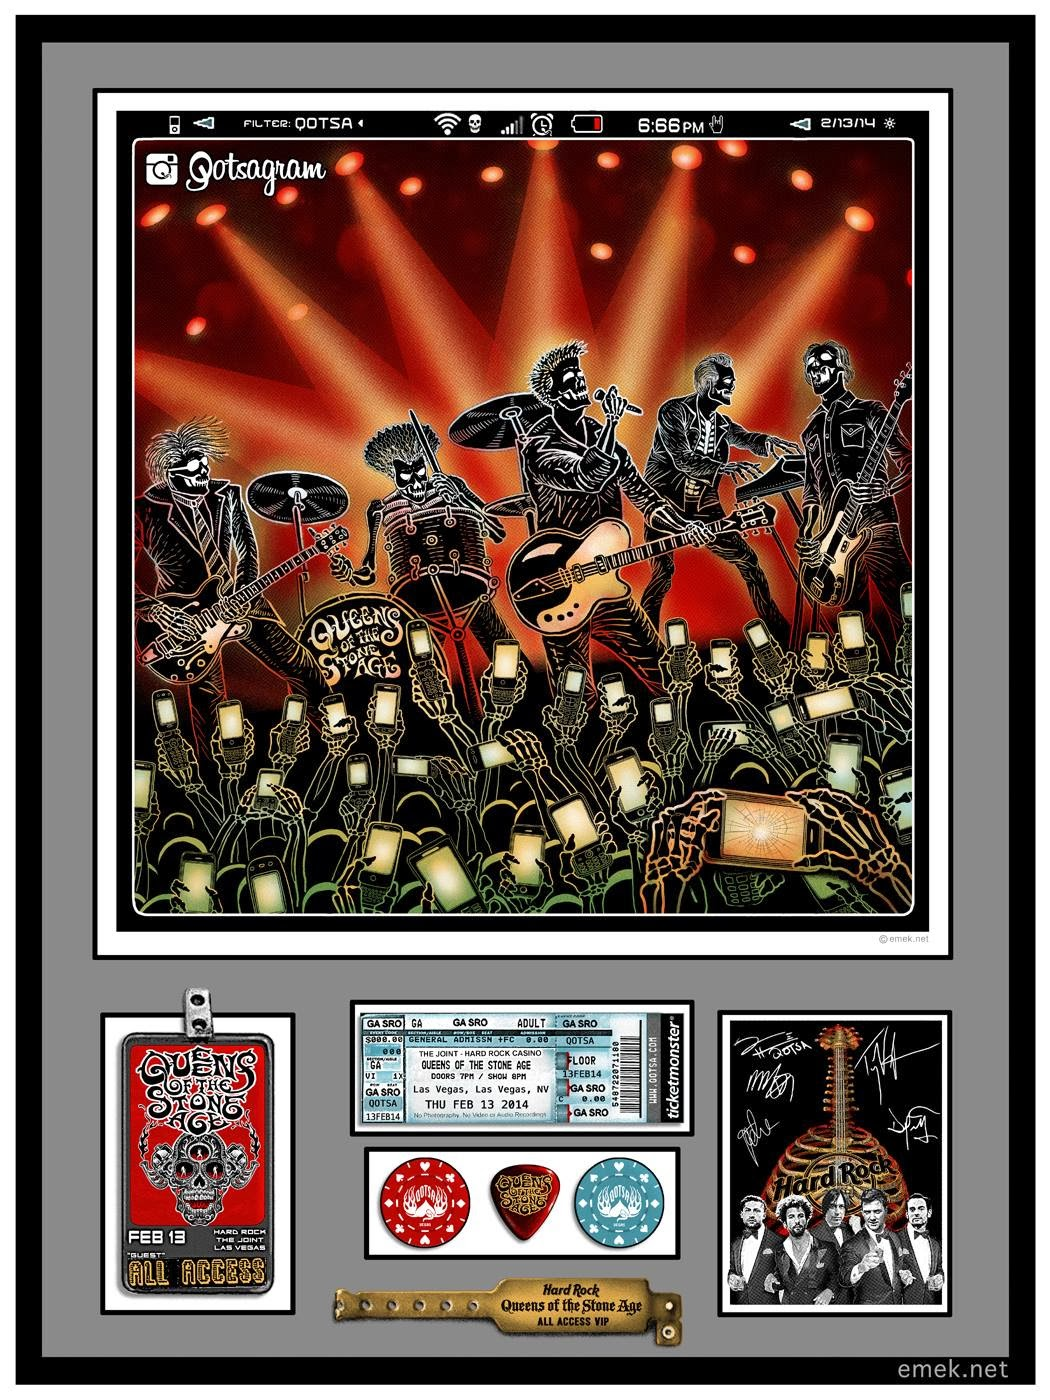 Emek-Queens-of-the-Stone-Age-Las-Vegas-Poster-1.jpg